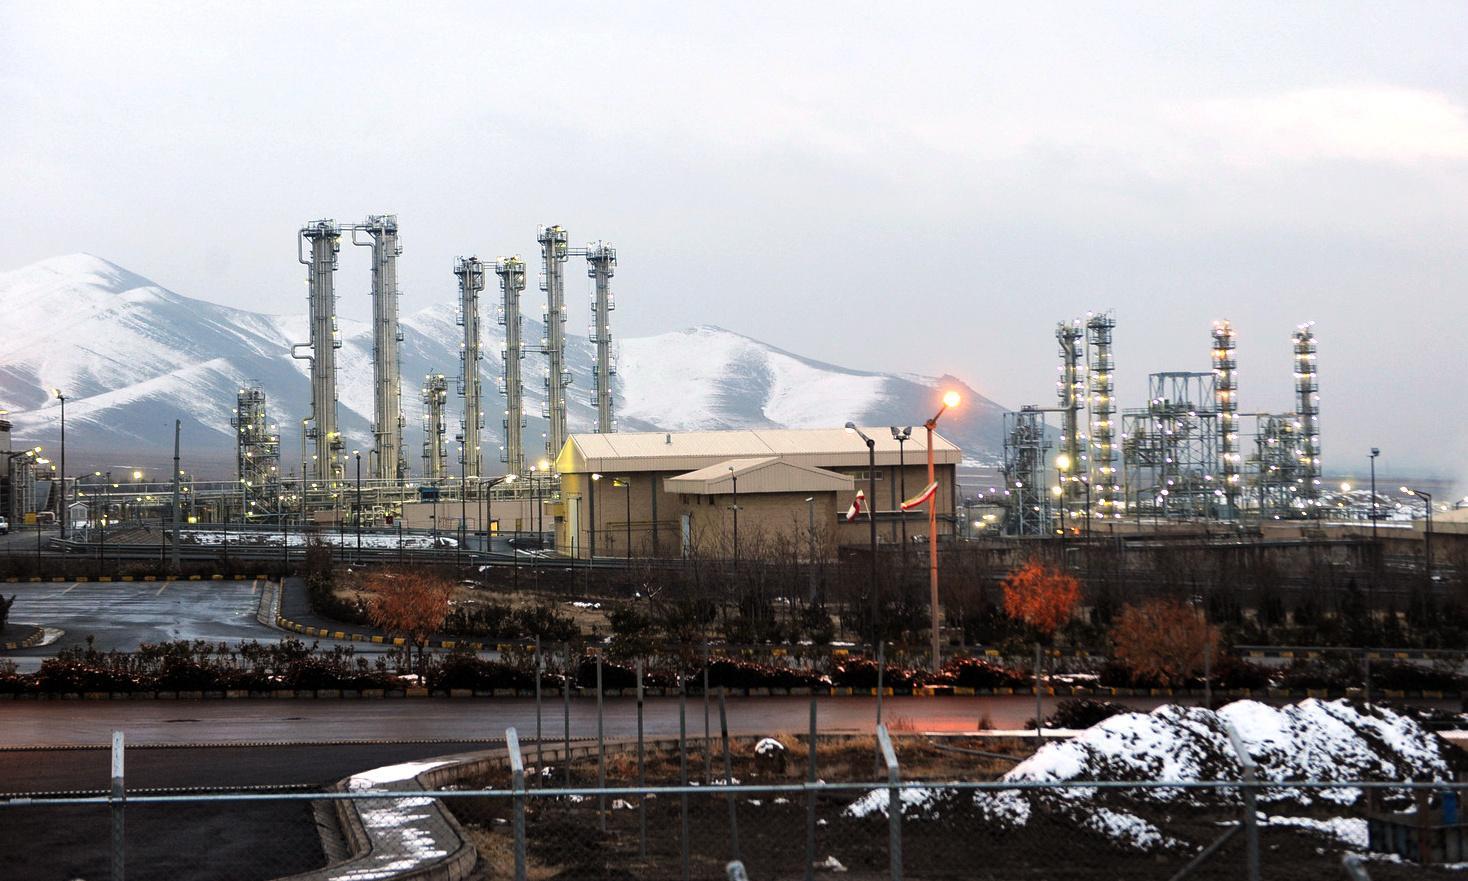 Iran to break uranium stockpile limit set by nuclear deal